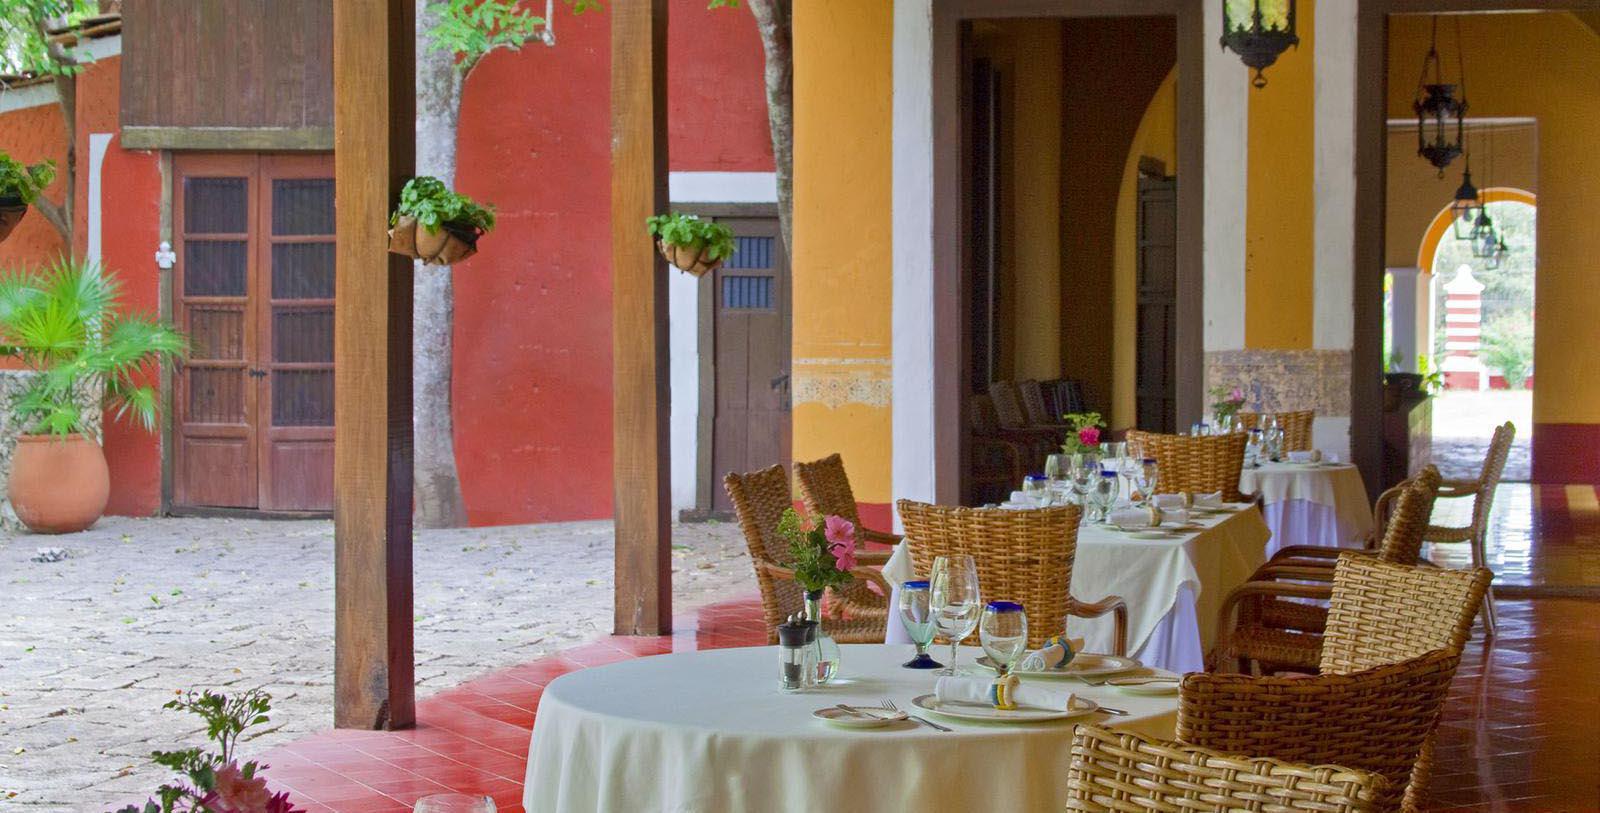 Image of Santa Rosa Restaurant, Hacienda Santa Rosa, A Luxury Collection Hotel, Santa Rosa, Mexico, 1897, Member of Historic Hotels Worldwide, Taste